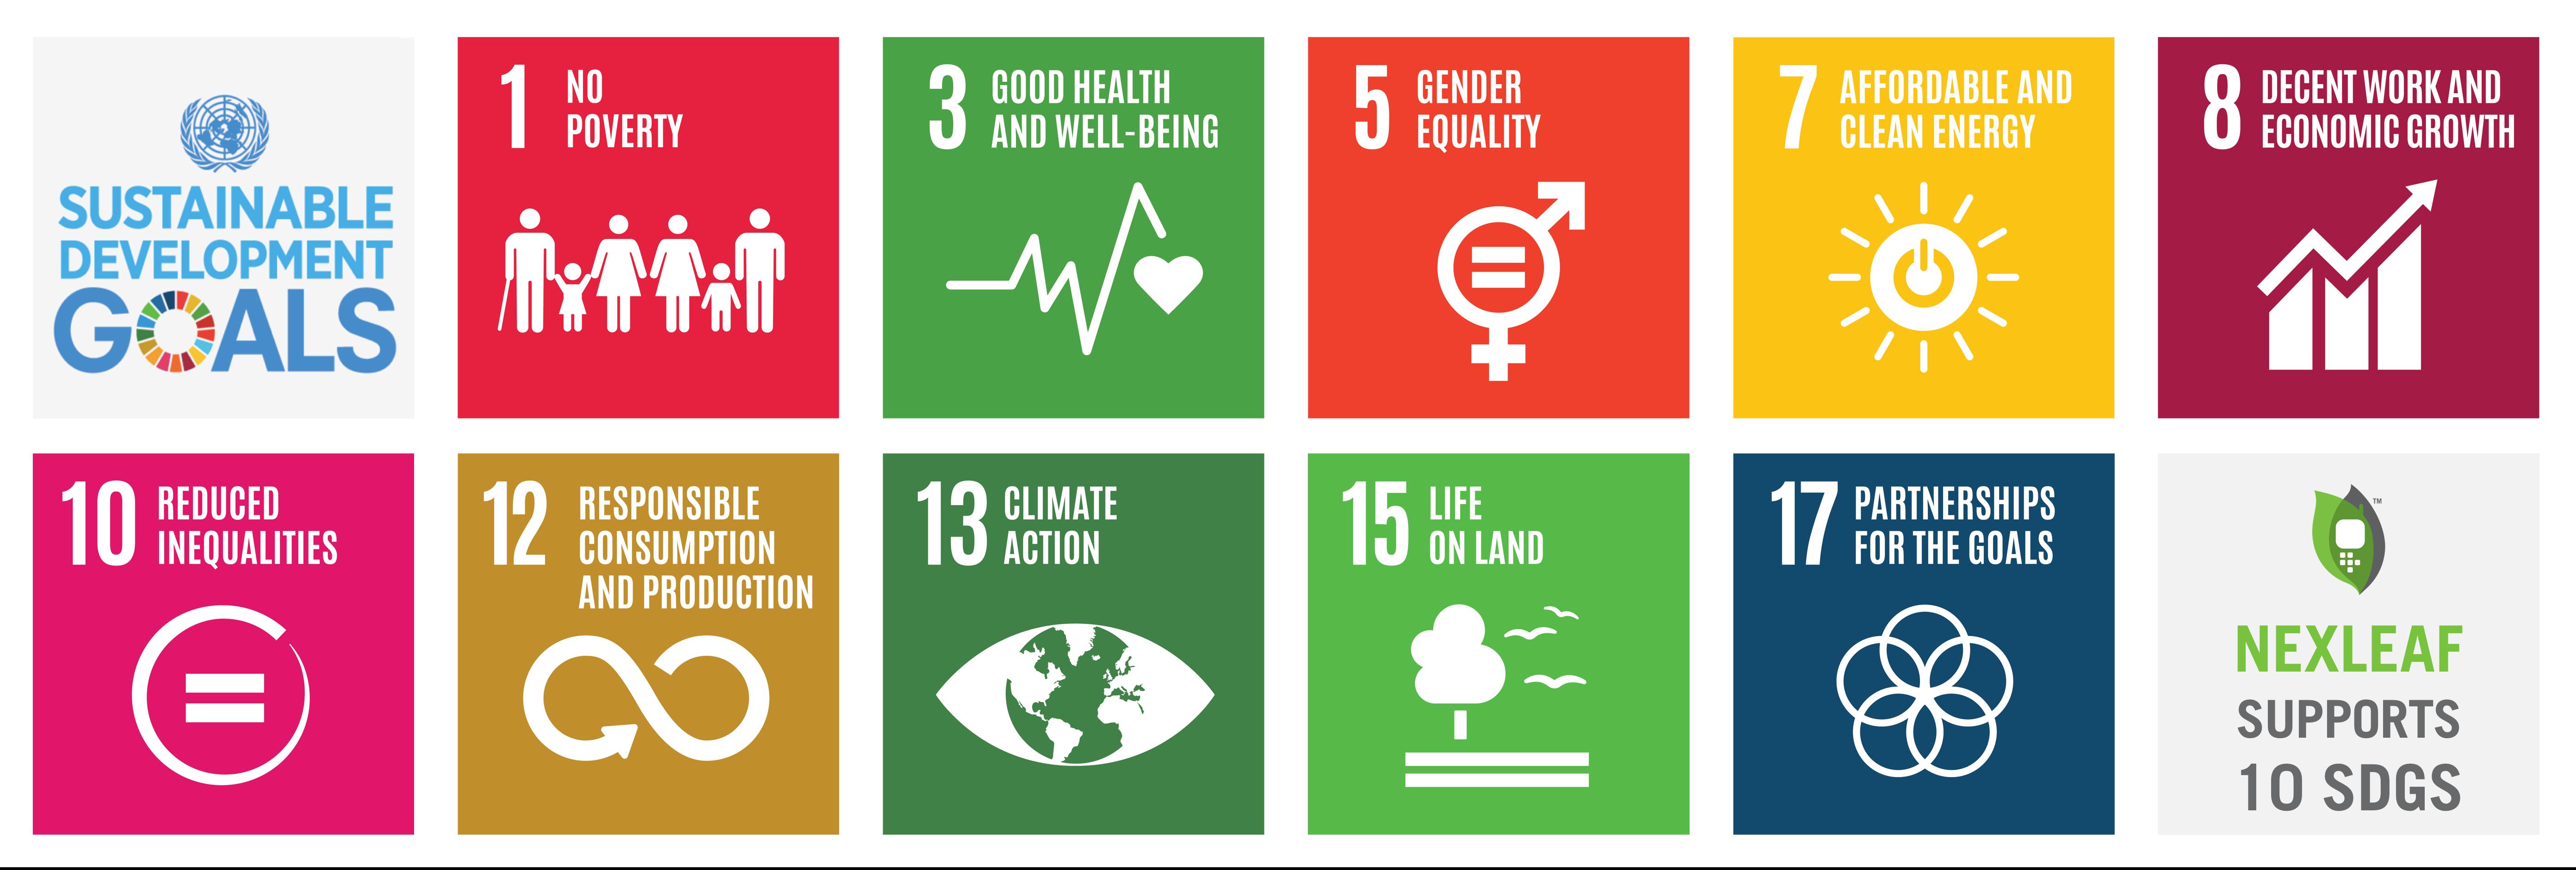 SDGbanner4